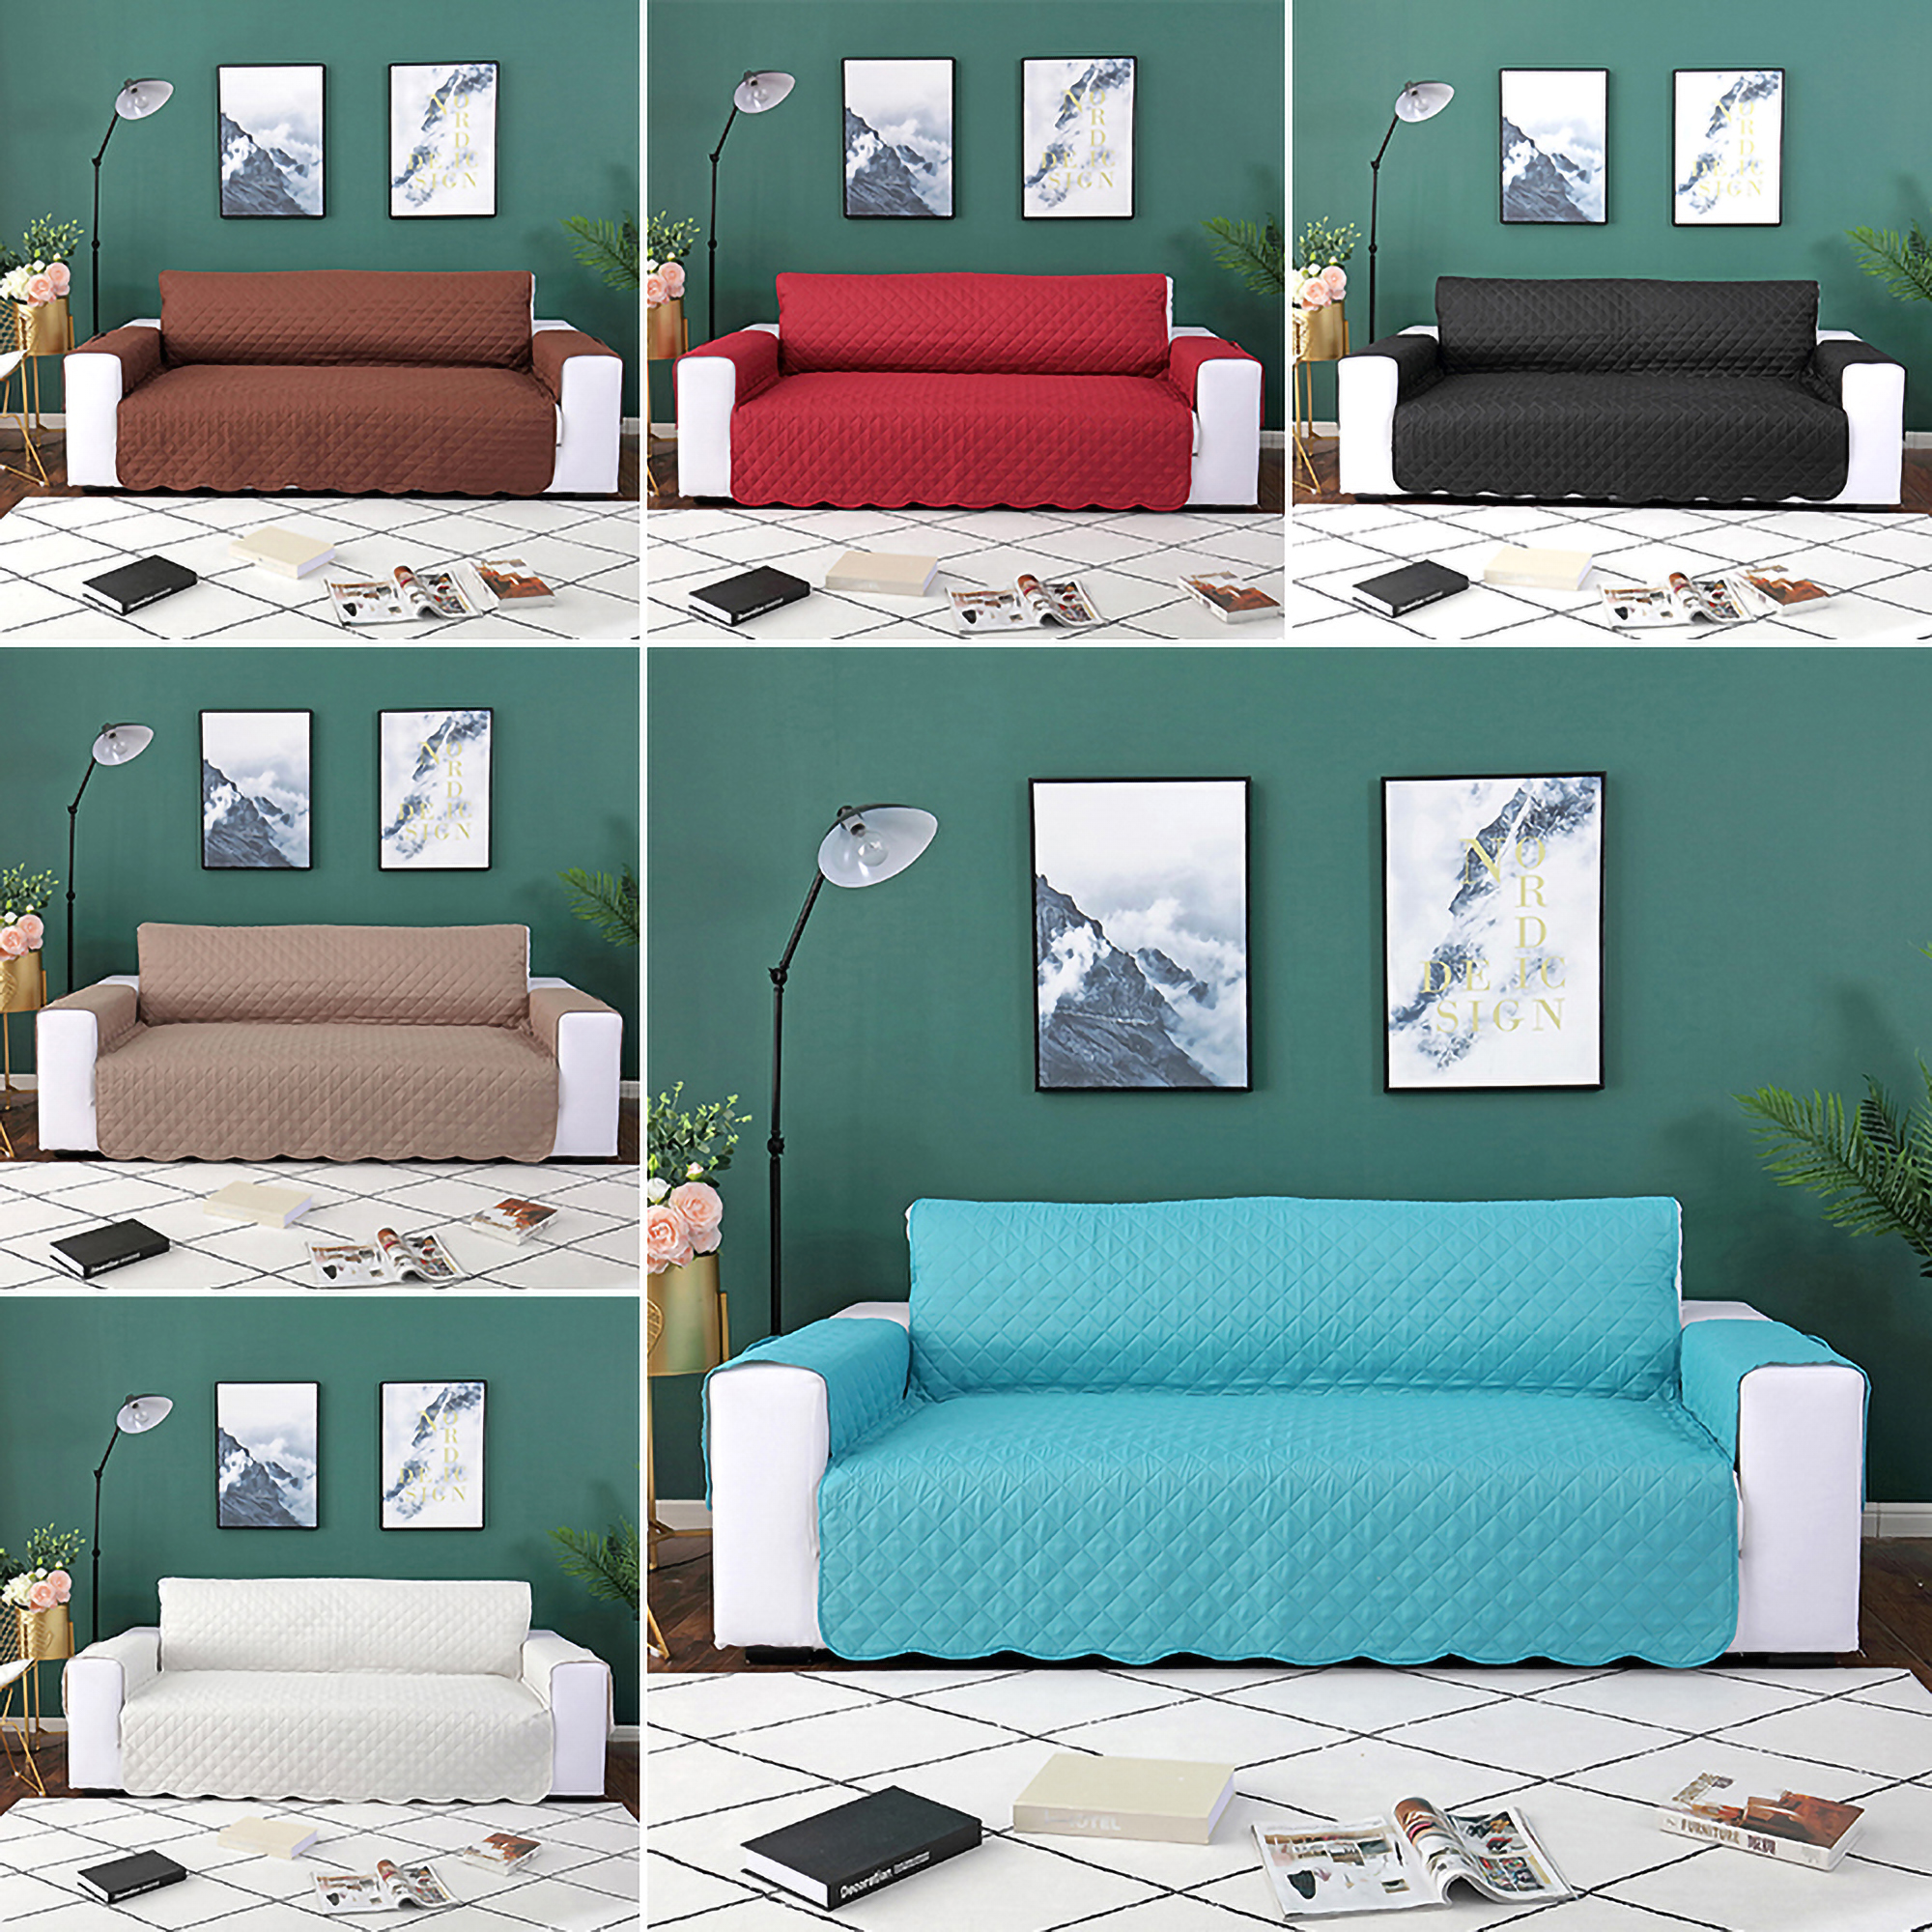 Plain Sofa Kissenbezug Dekokissen Sham Decor Kissenbezug Cover 50 x 50cm